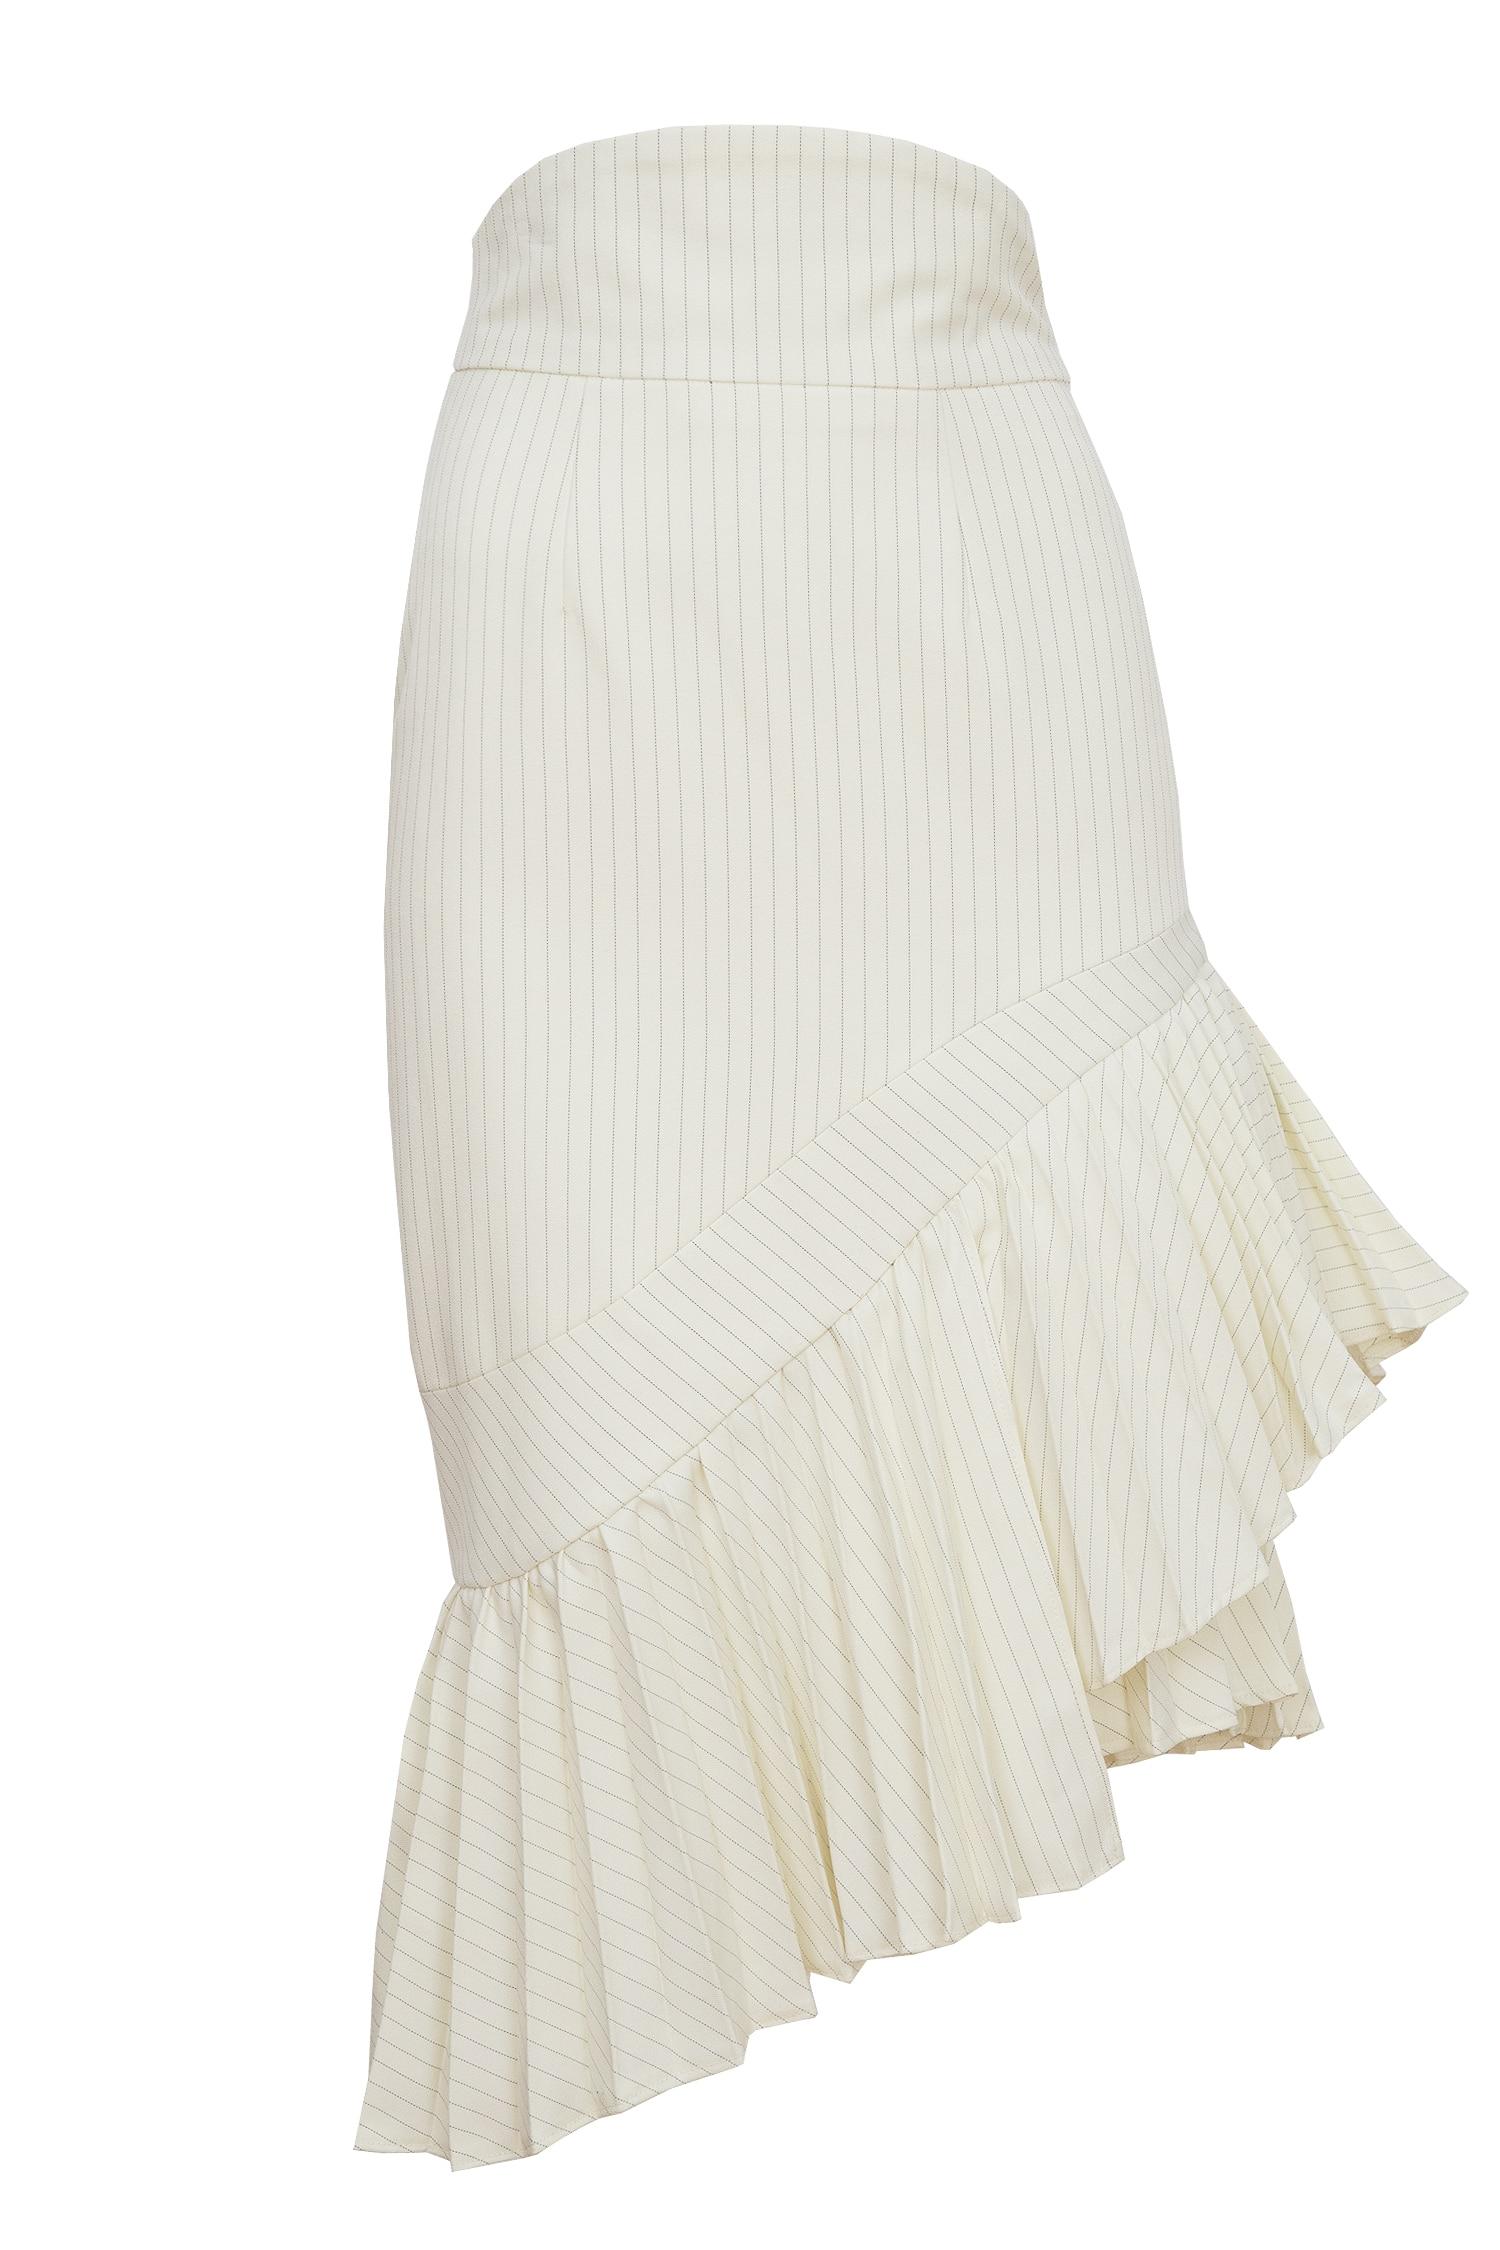 White Magic skirt